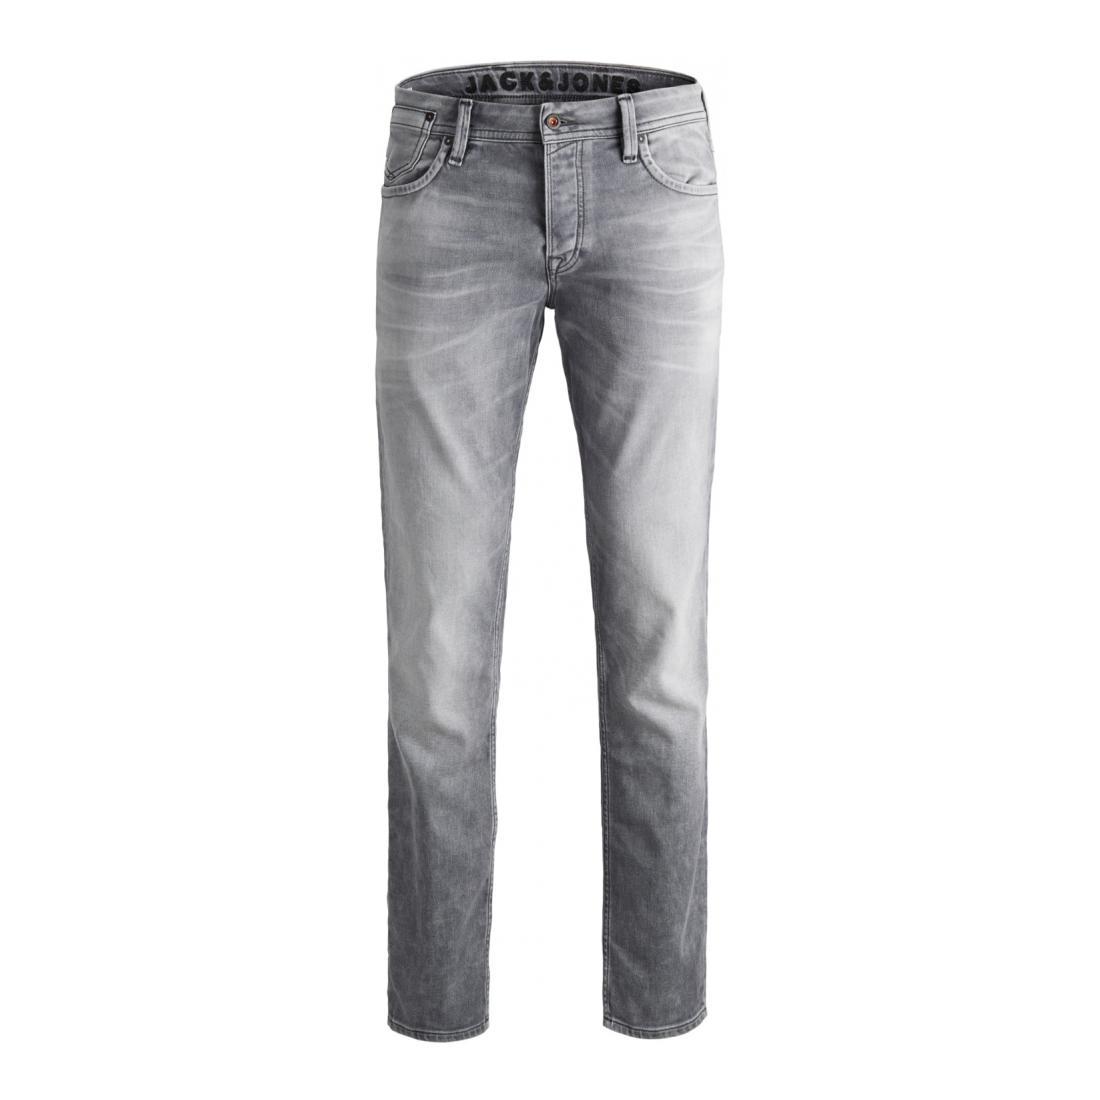 Jack & Jones Jeans Herren JJITIM JJLEON GE 067 I.K